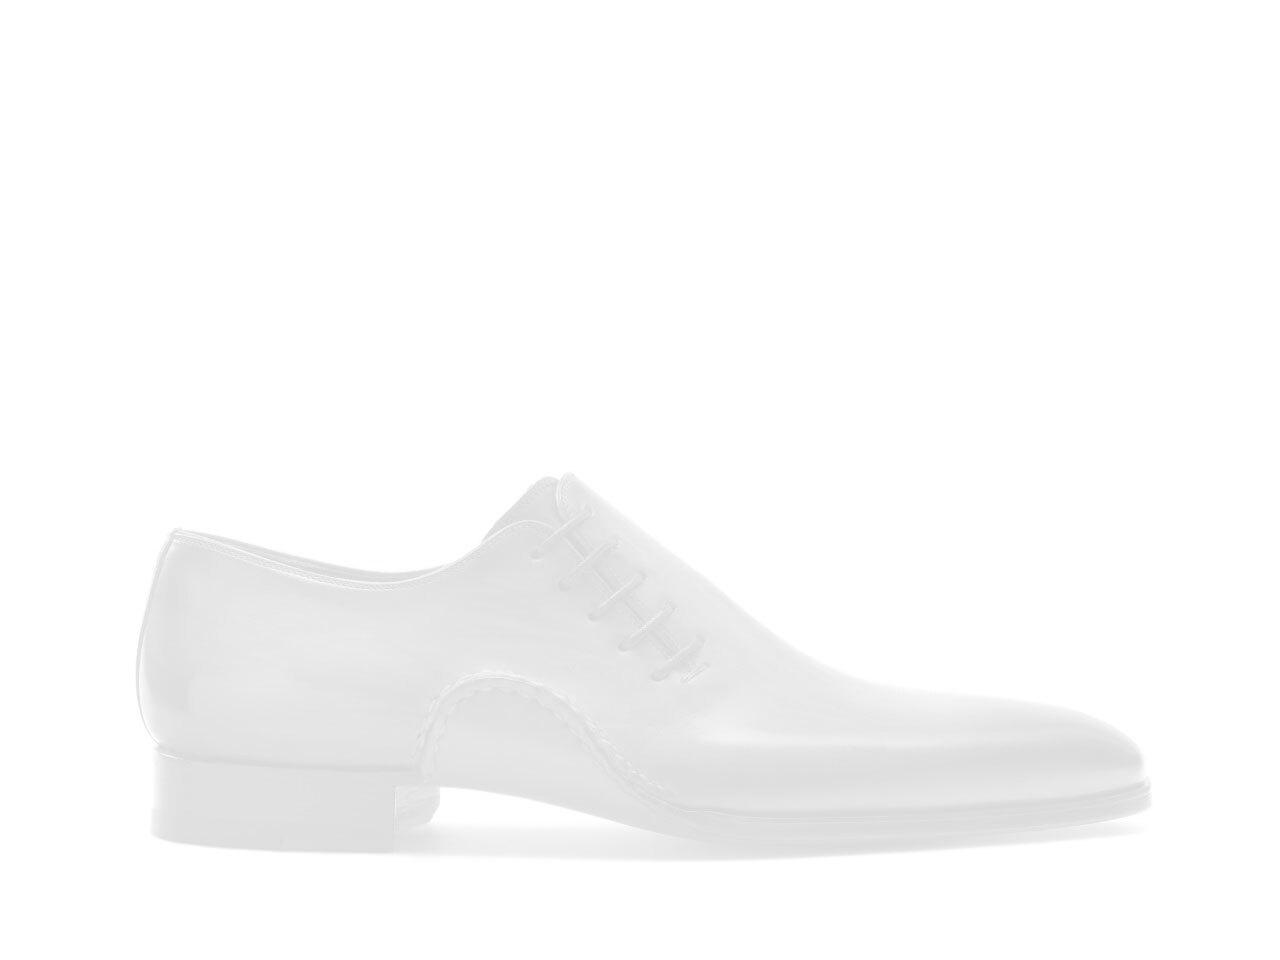 Sole of the Magnanni Reina Cognac Men's Sneakers